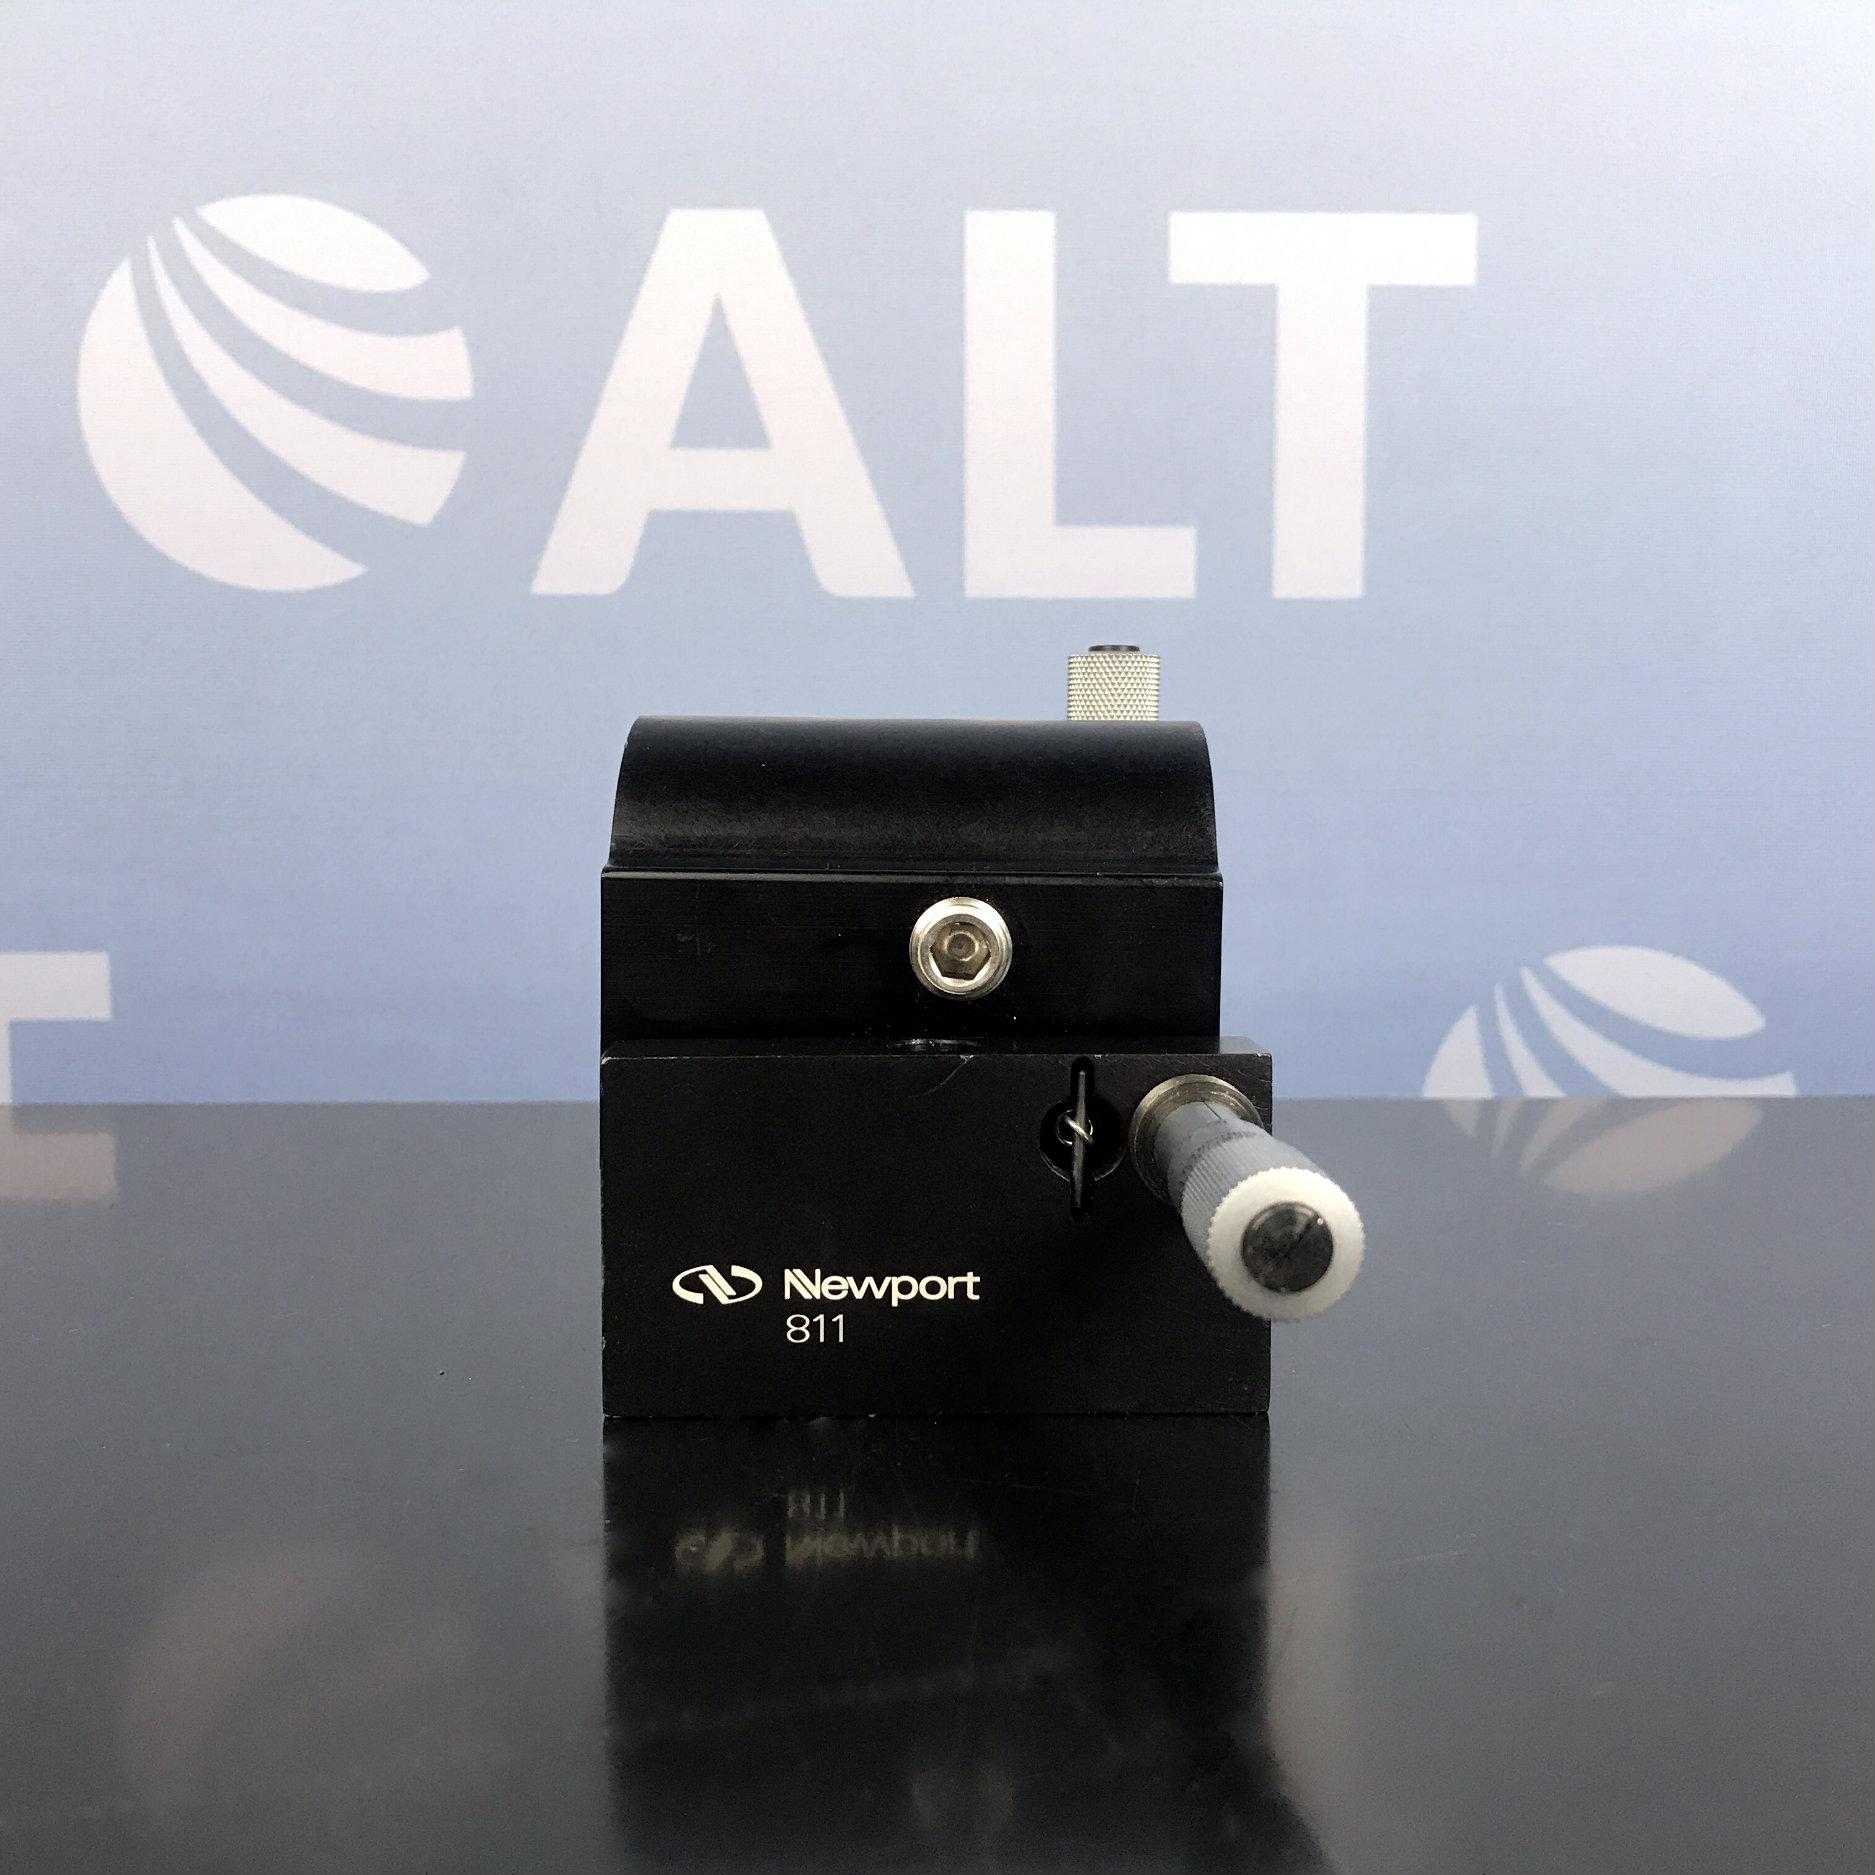 Newport 811 Laser Mount Image